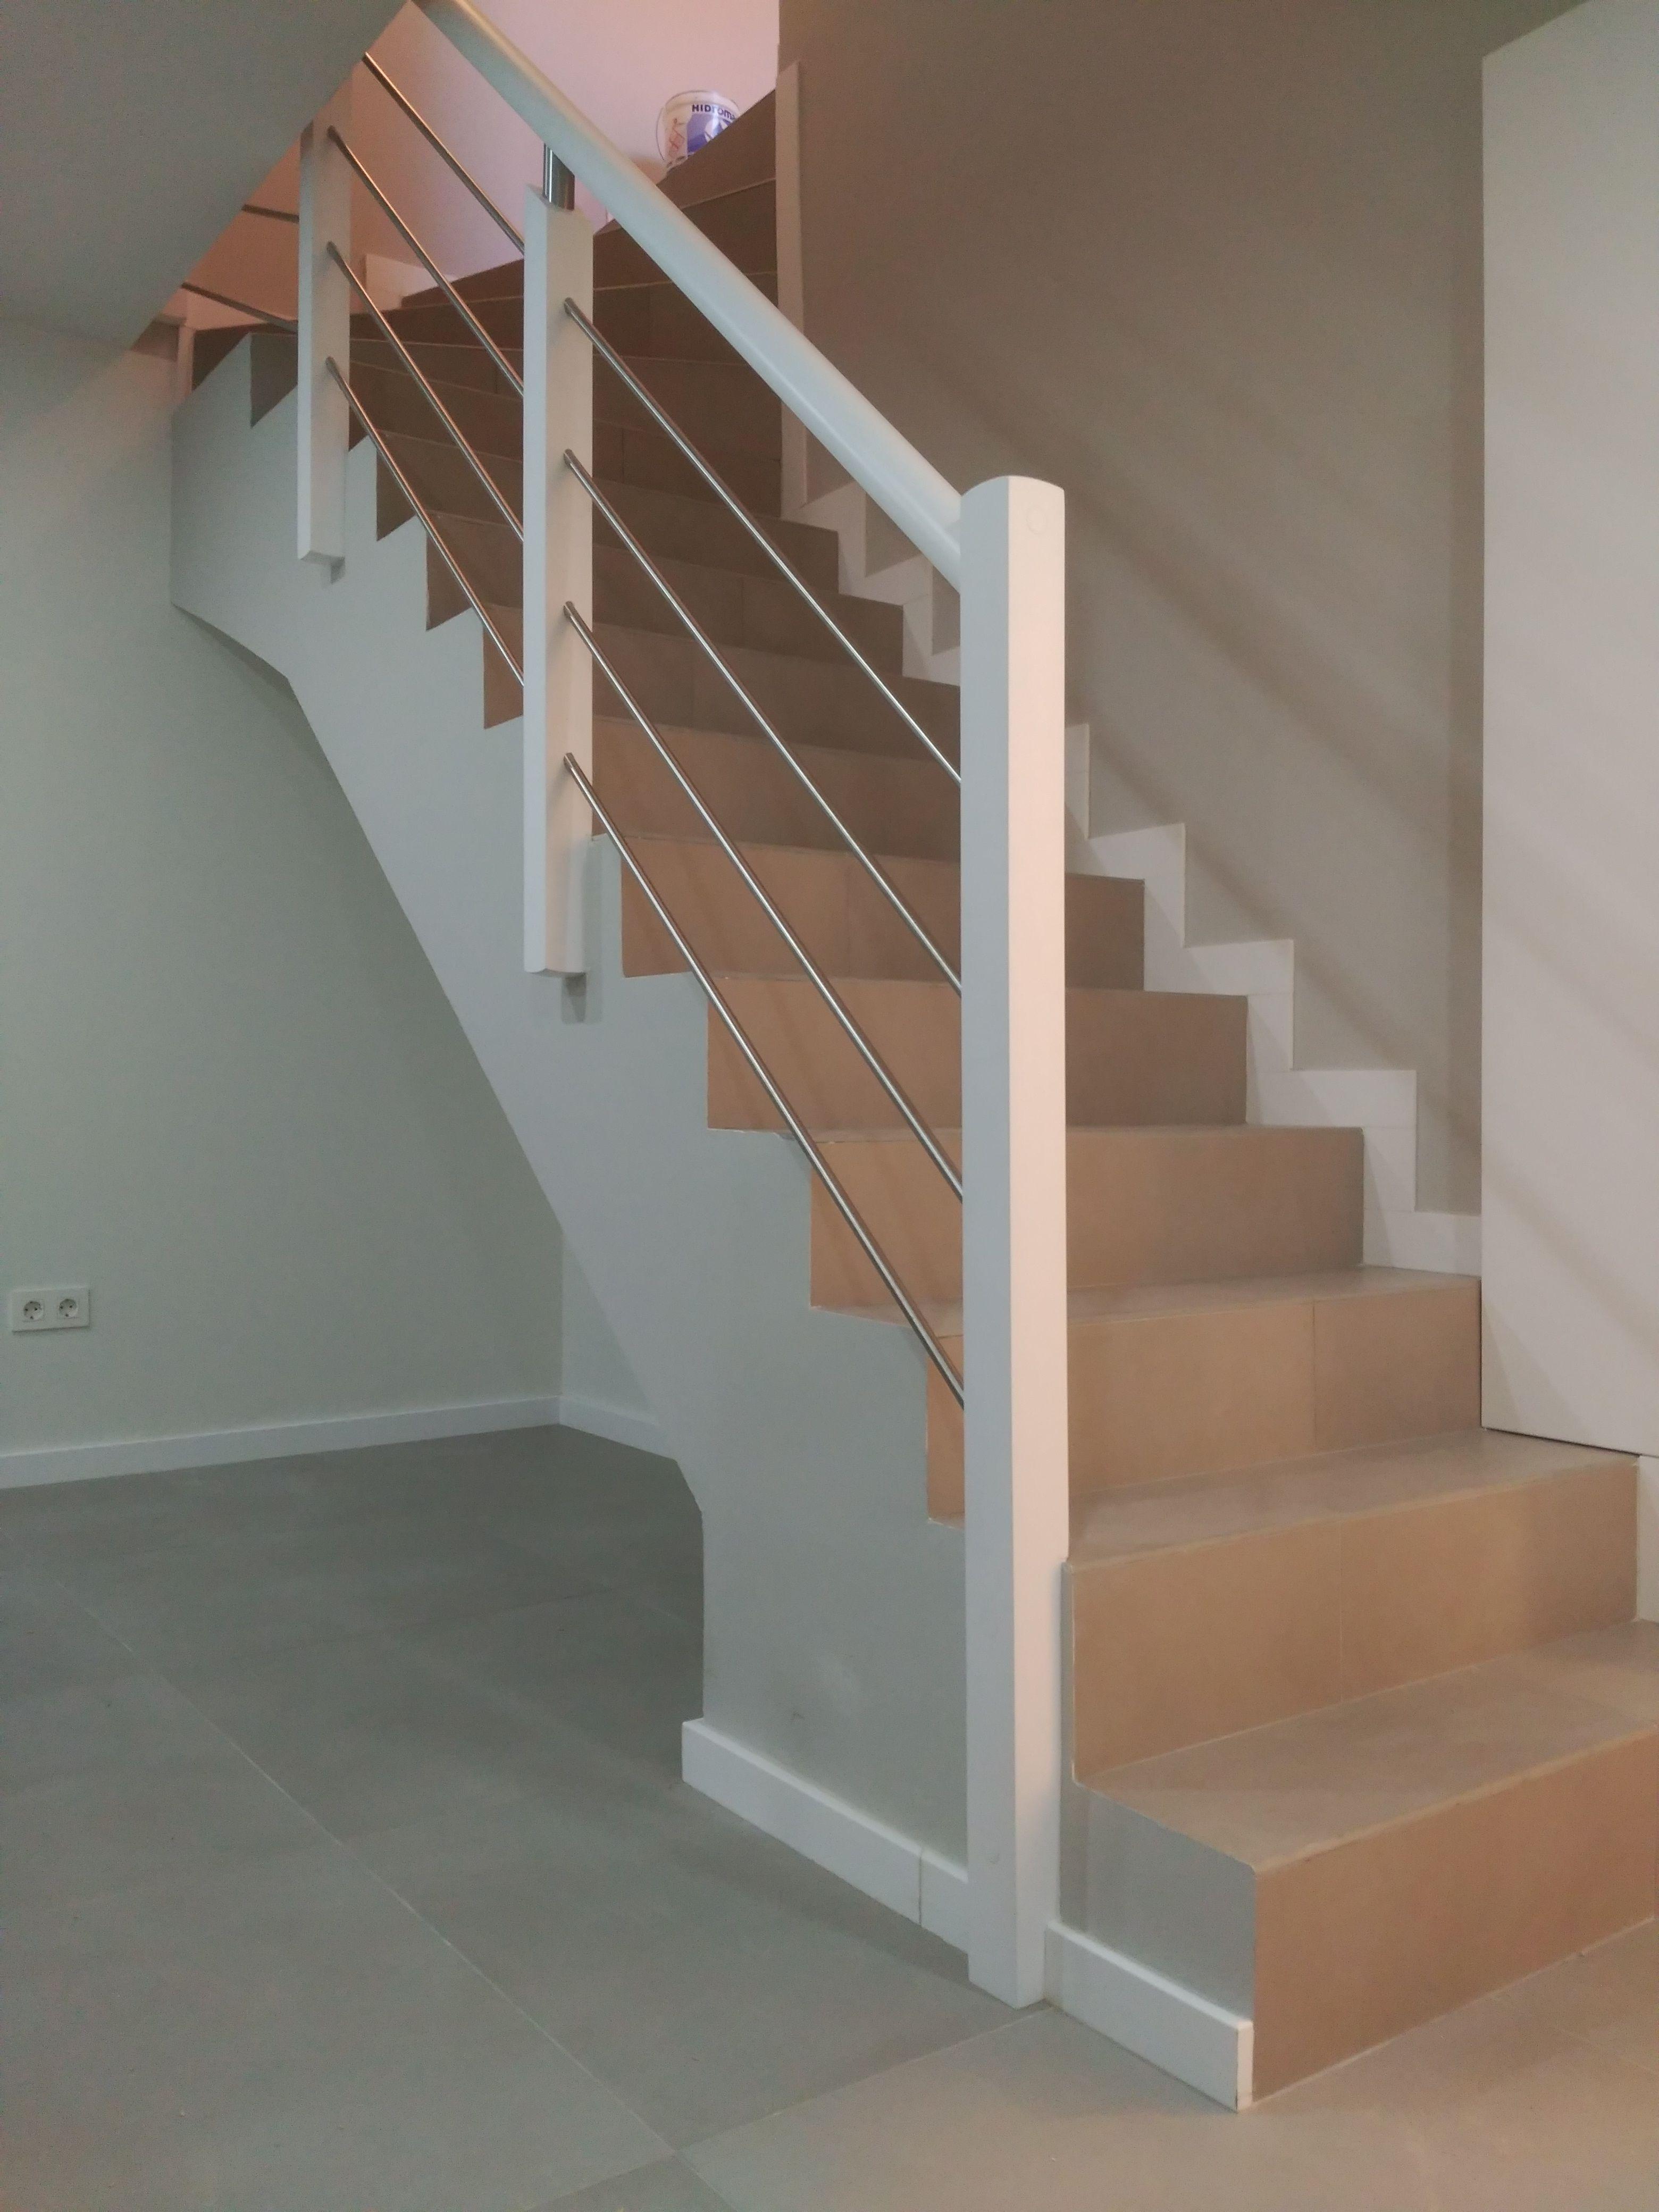 Barandilla para escalera de obra en 2019 barandillas pinterest - Barandillas de madera para interior ...